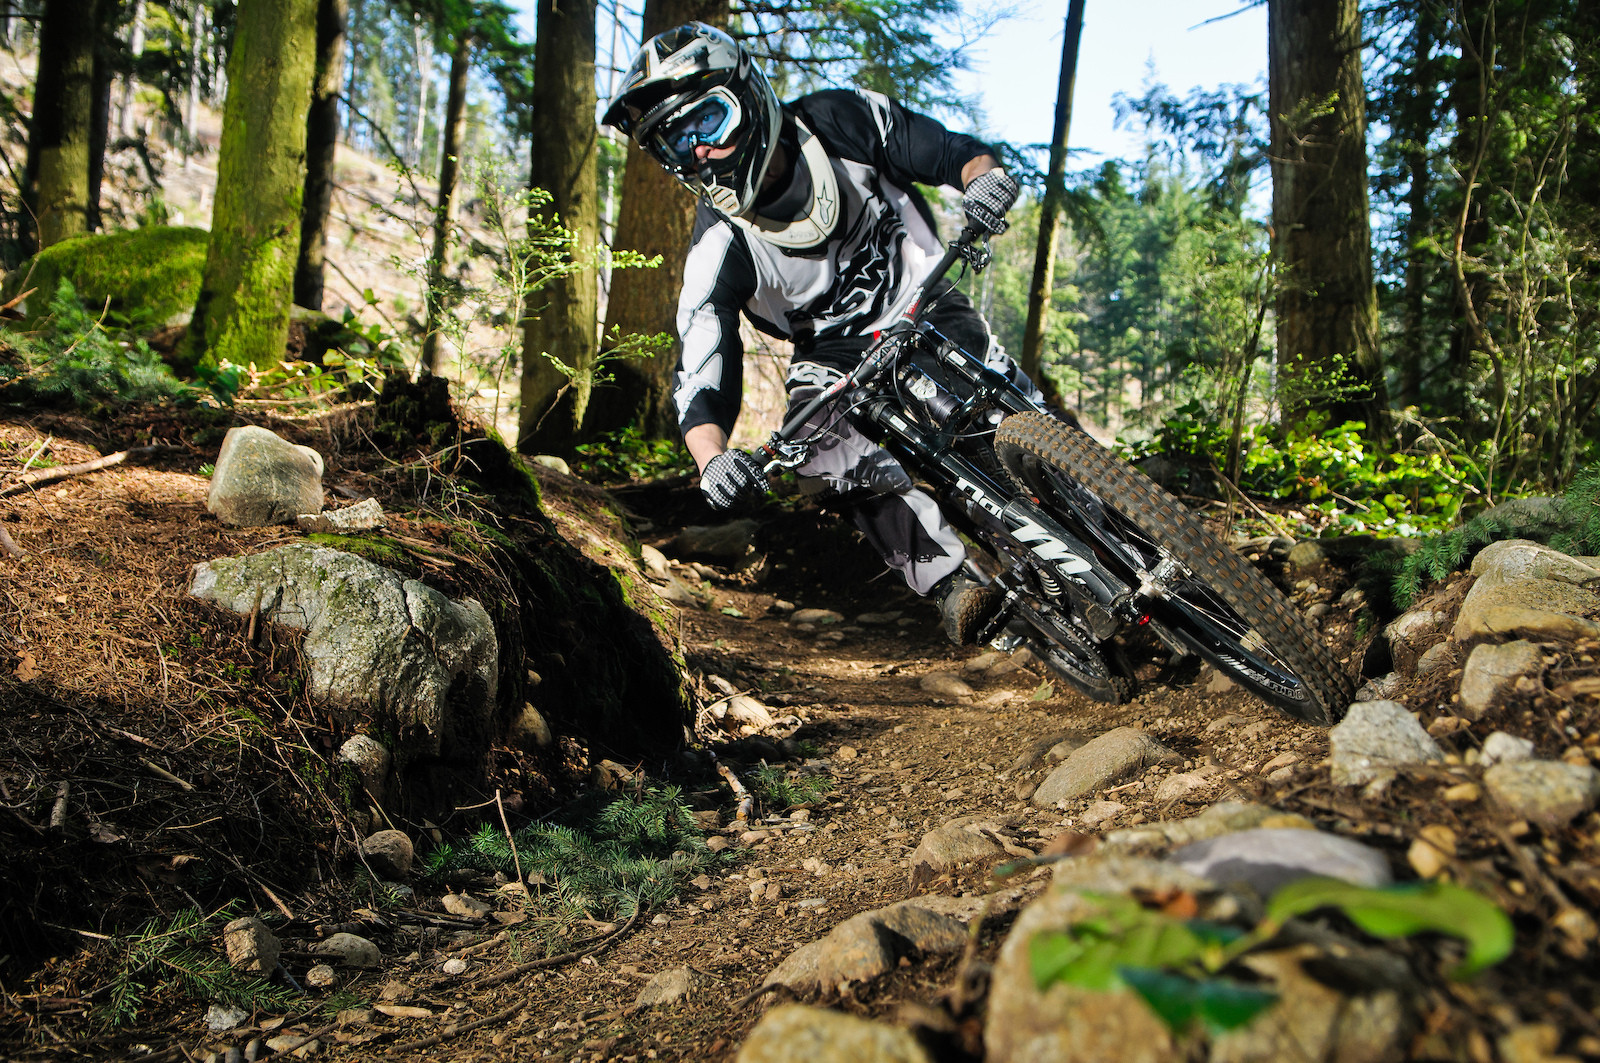 Look ahead - dave-m - Mountain Biking Pictures - Vital MTB